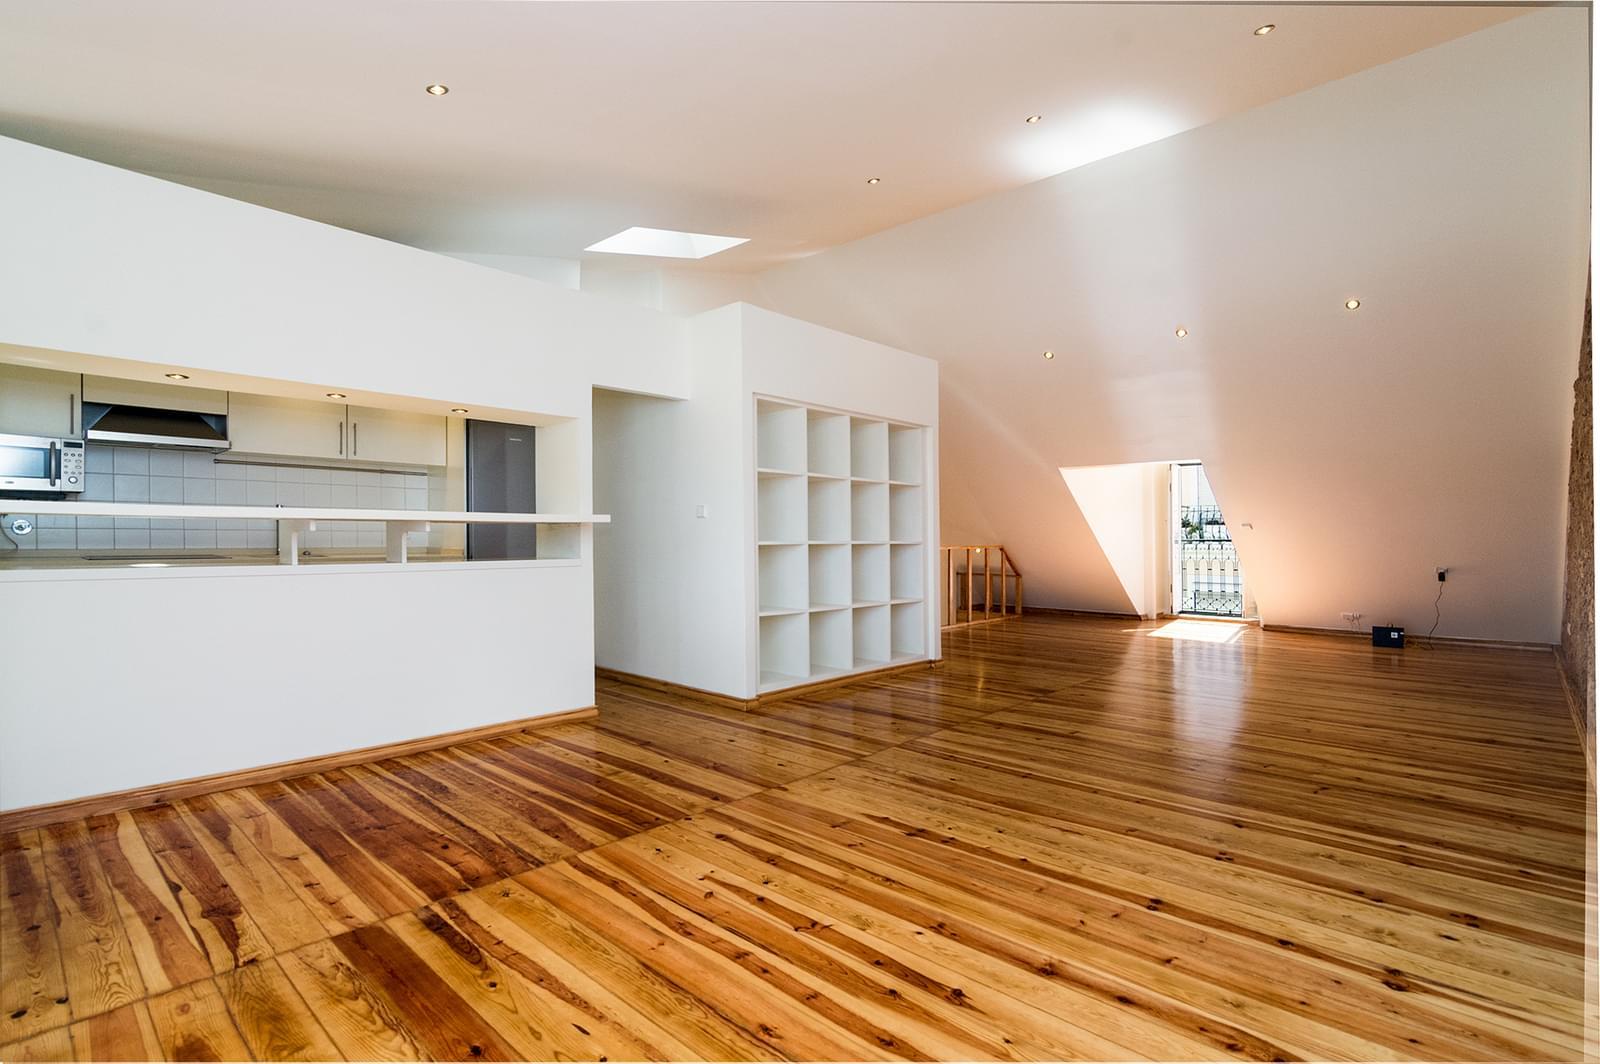 pf17176-apartamento-t0-lisboa-cfbe004e-82b0-453f-9df8-788aa87db817